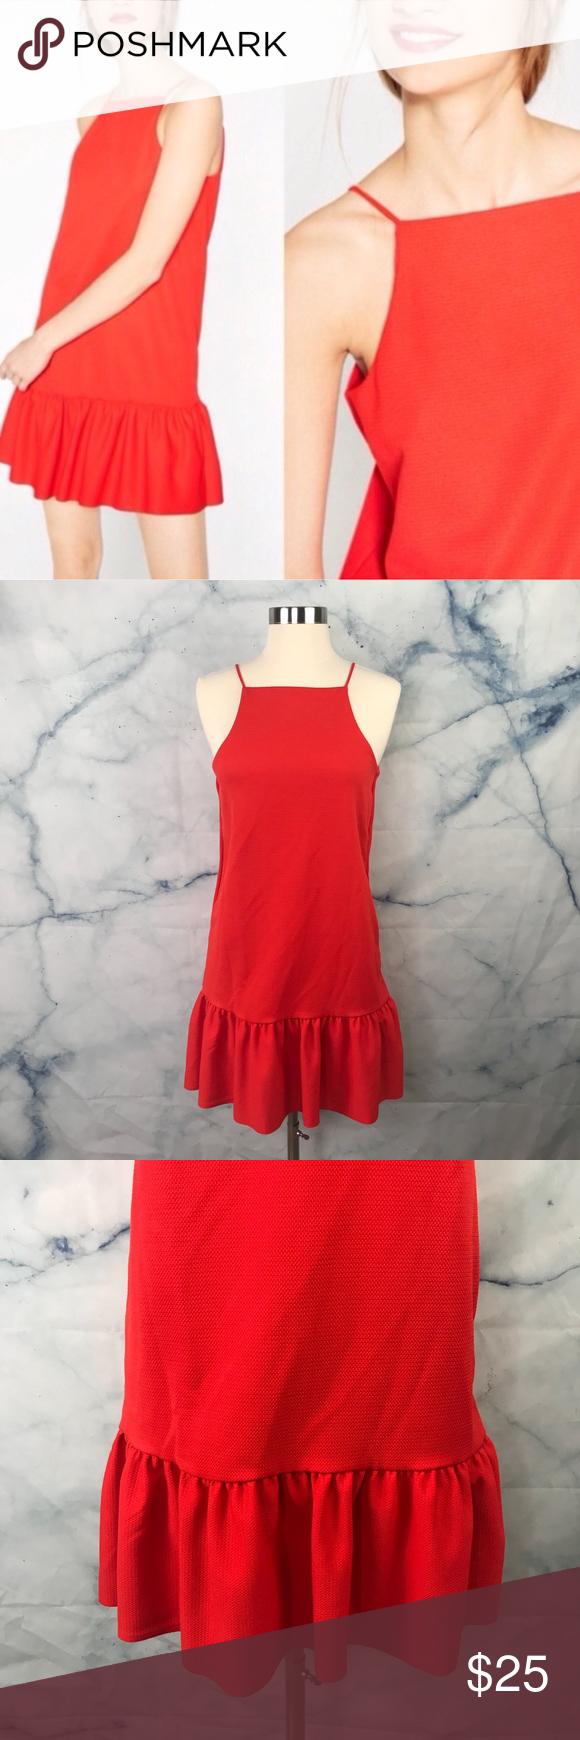 67ab03e1 Zara W/B Collection Orange Halter Shift Dress New with tags Zara size  medium, orange-red mini dress with halter style sleeveless top. Ruffle hem.